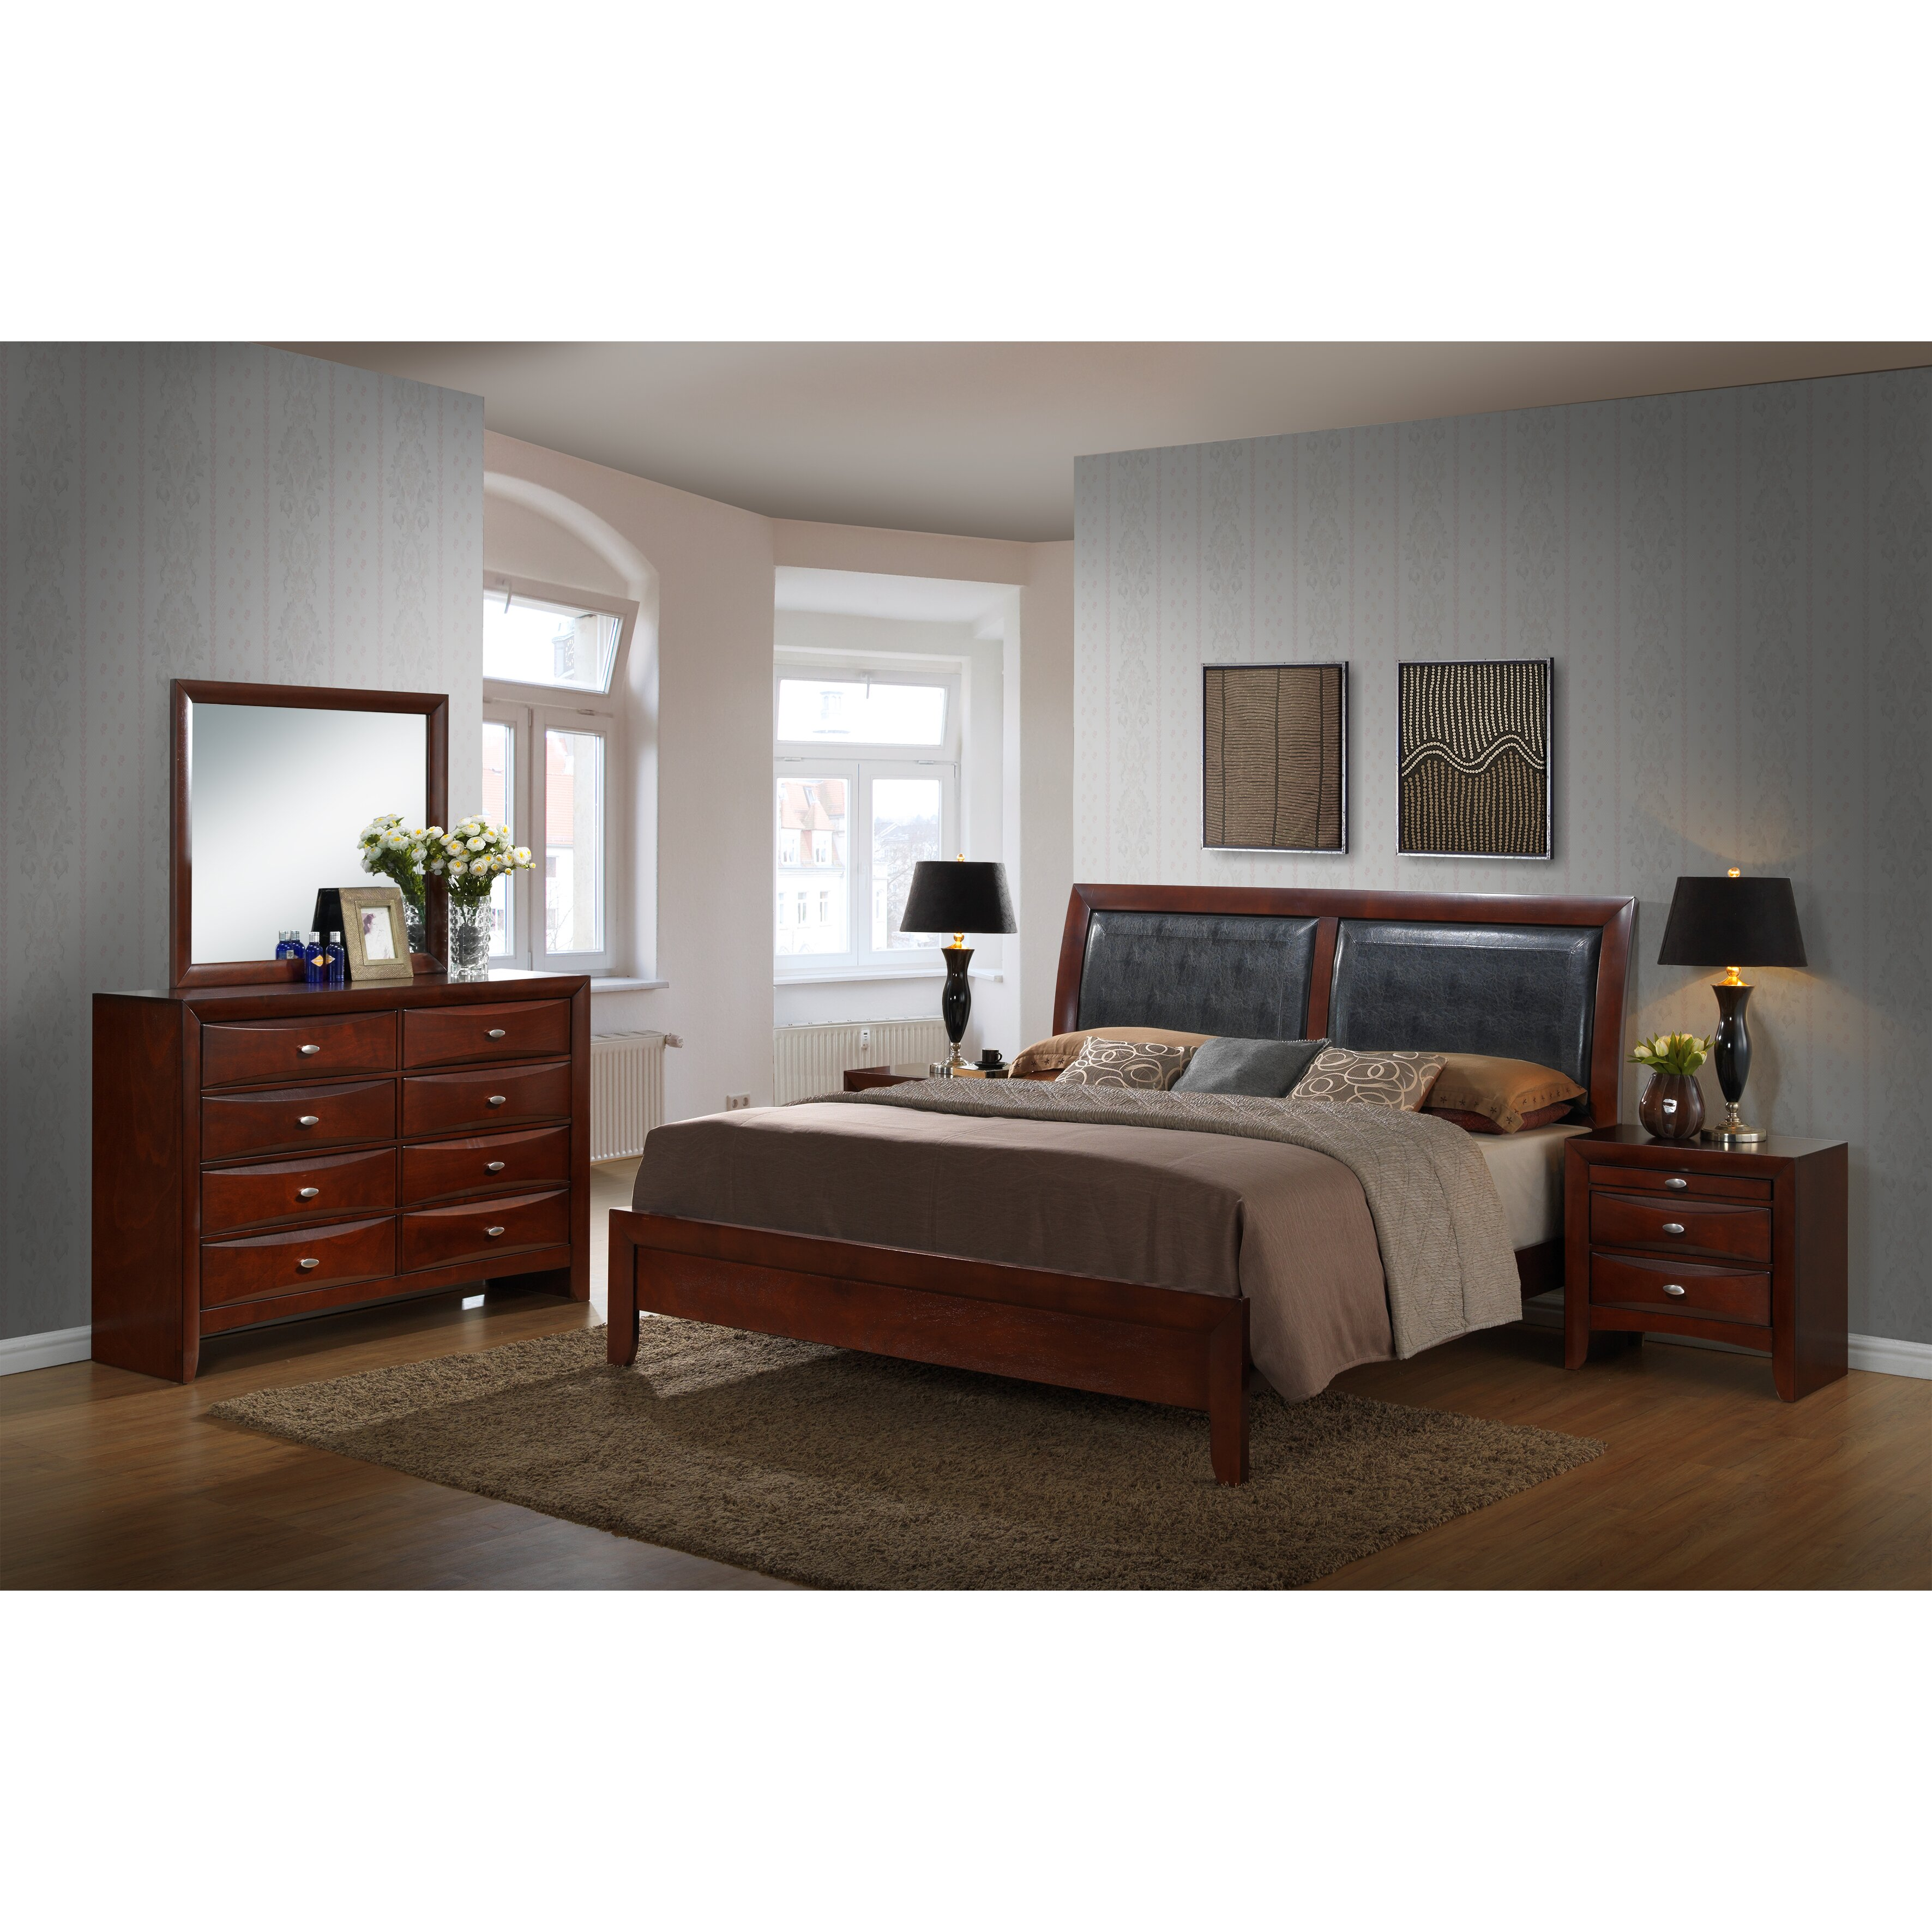 roundhill furniture emily panel 5 piece bedroom set wayfair emily wenge glossy bedroom set 5 pc global furniture